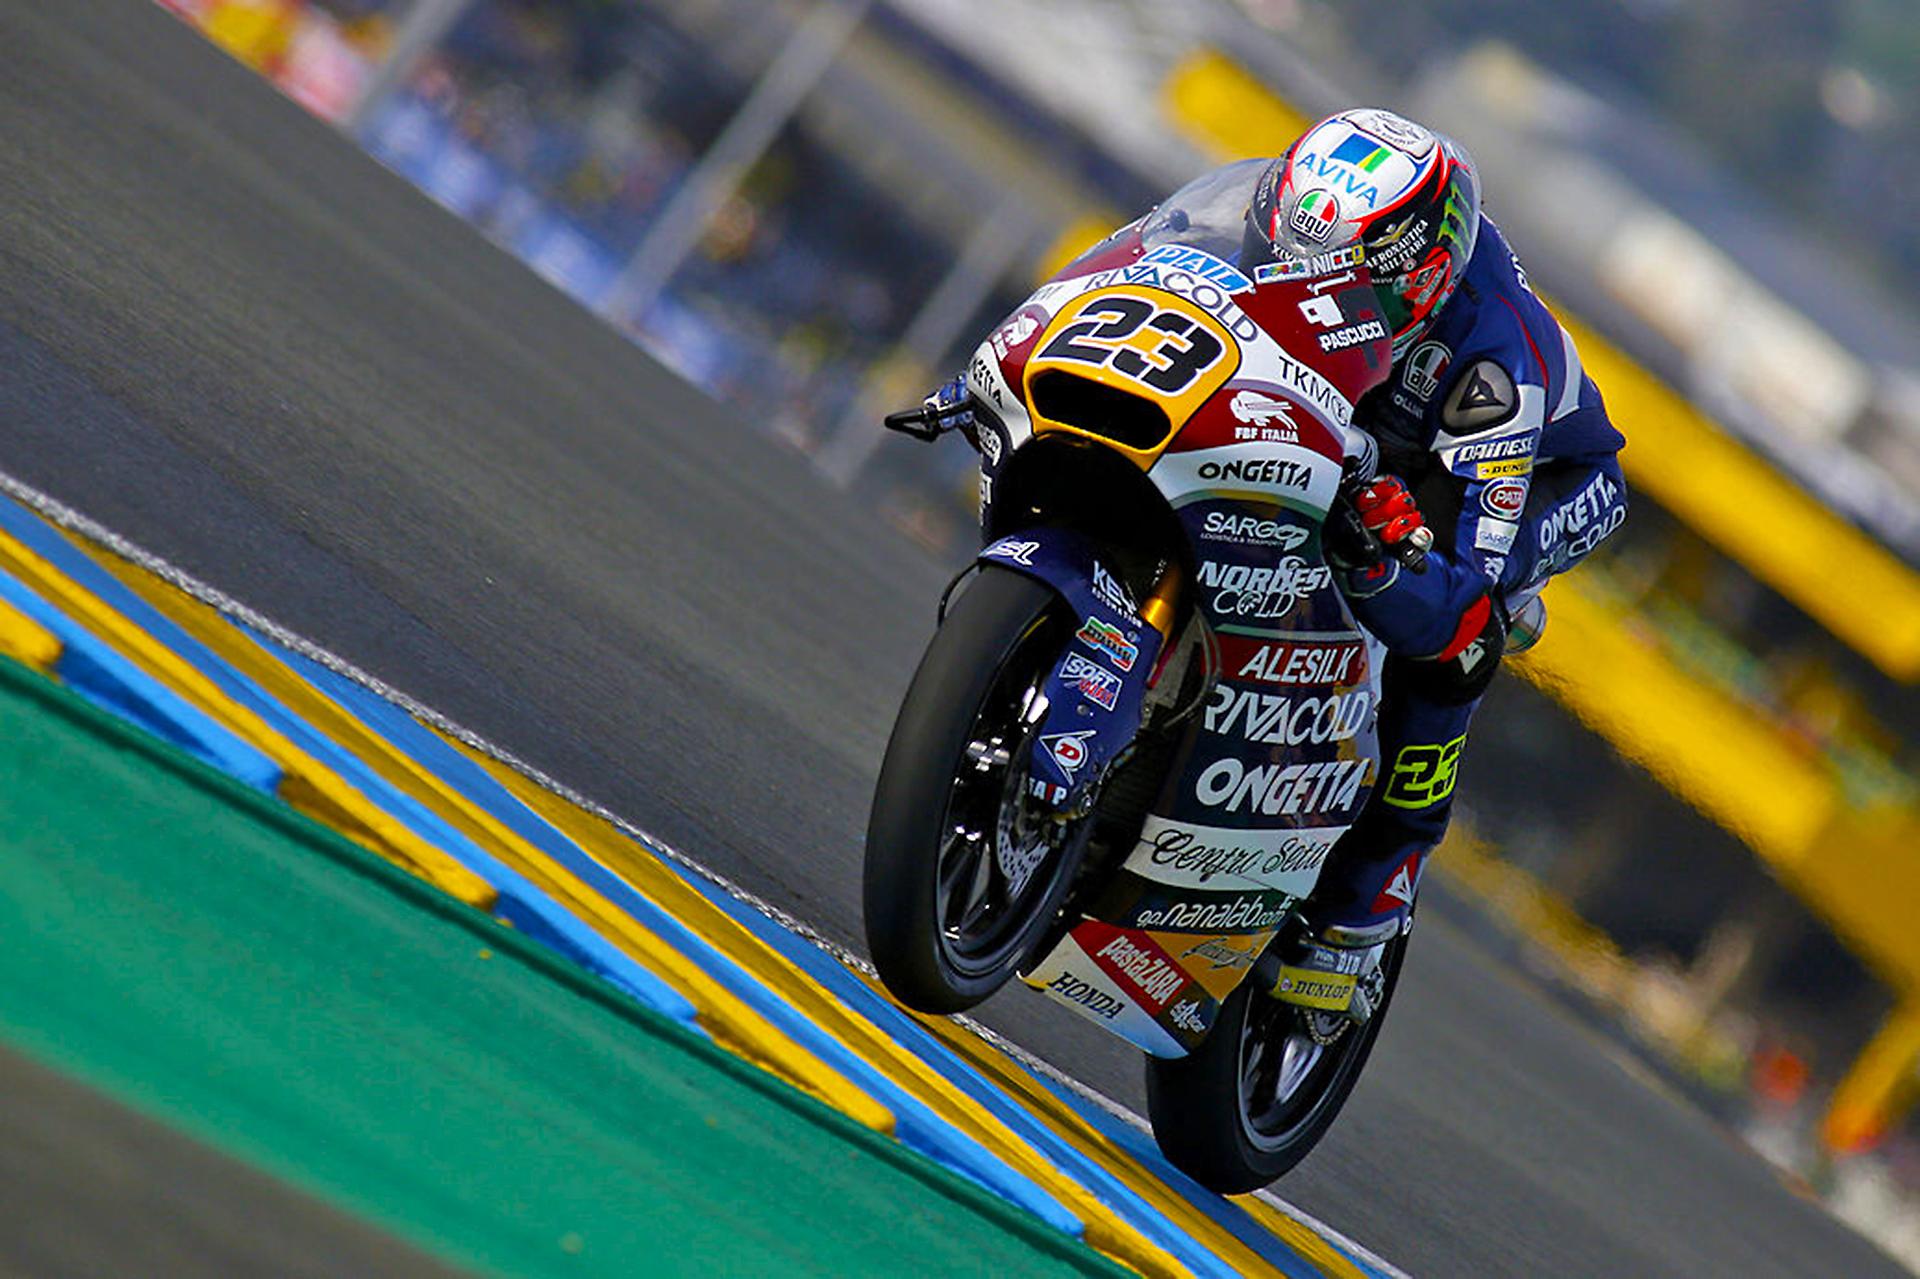 Nicolò Antonelli Moto3 World Championship